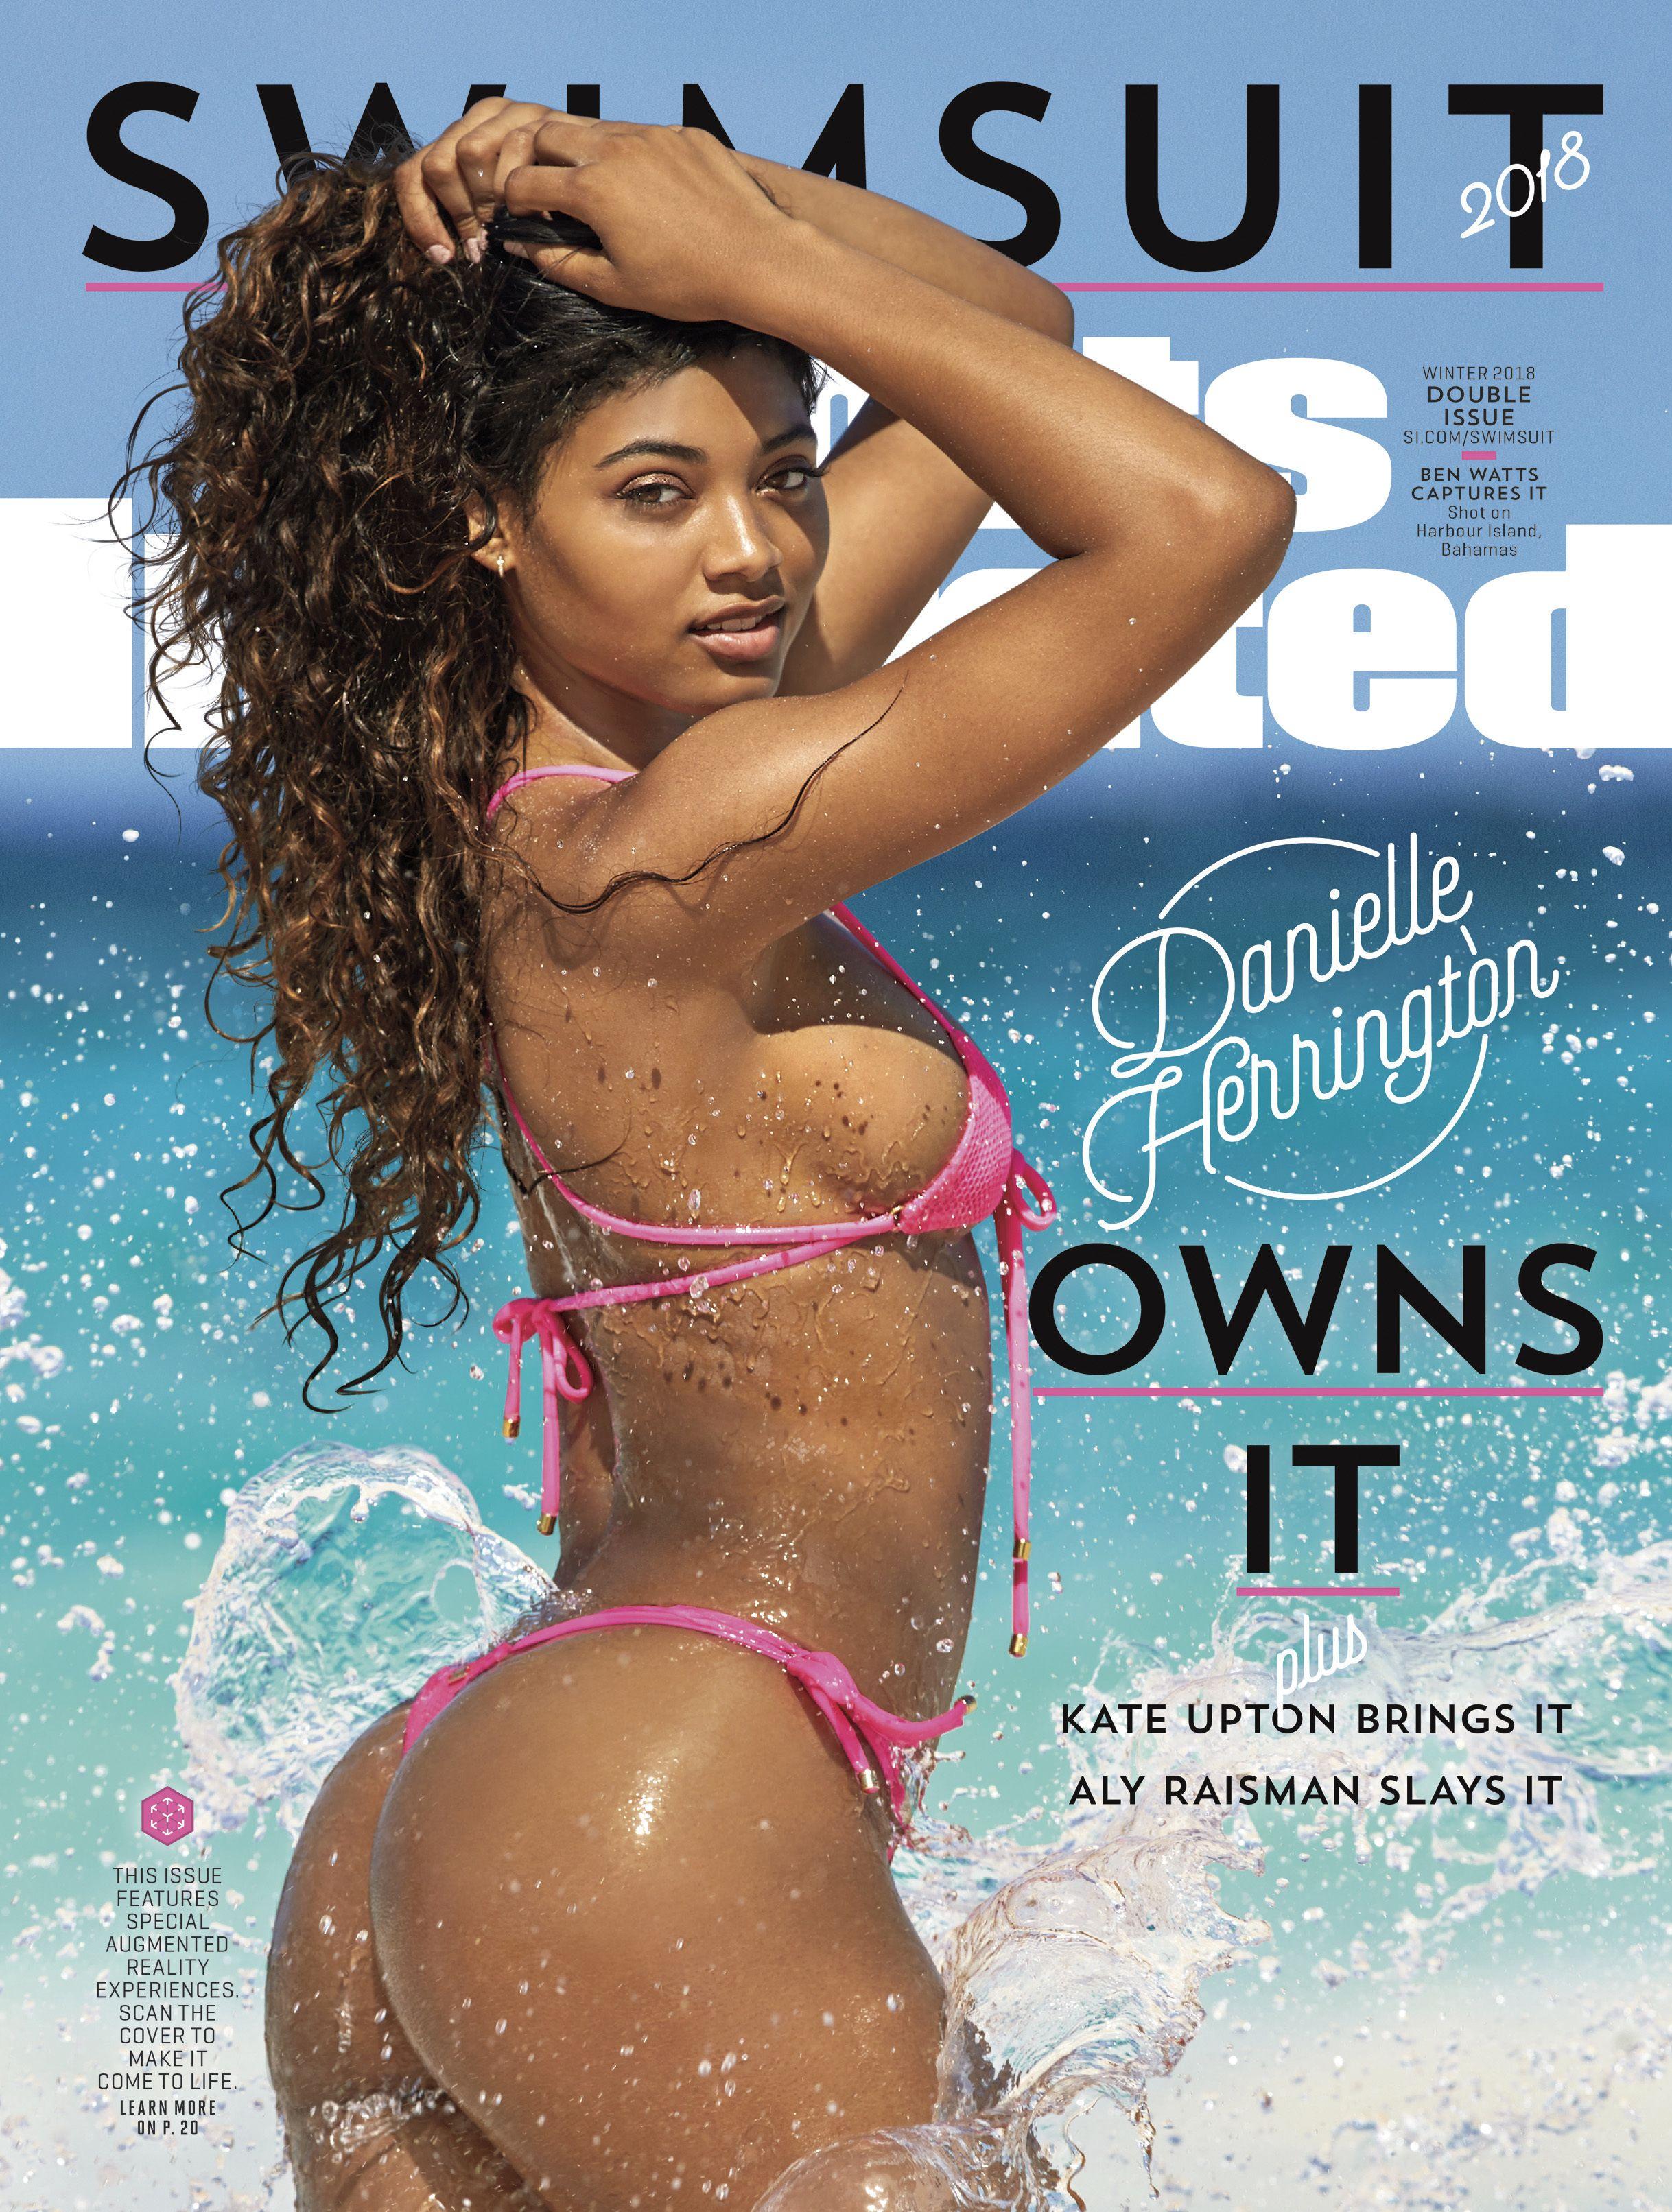 Danielle Harrington Sports Illustrated, Sports Illustrated 2018